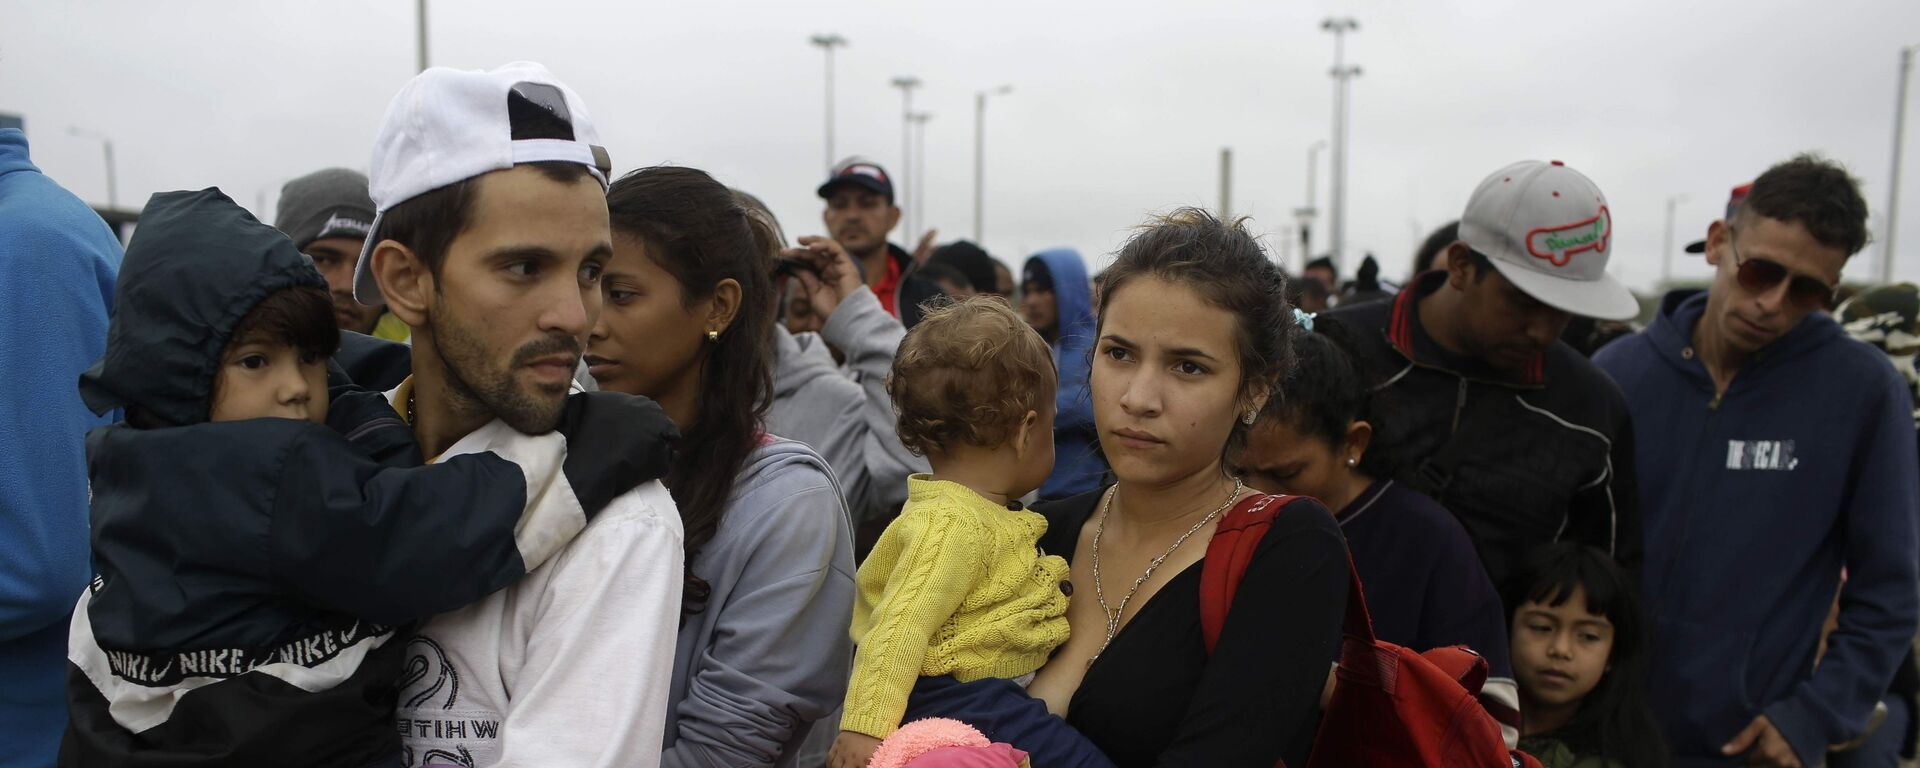 Migrantes venezolanos en Colombia (Archivo) - Sputnik Mundo, 1920, 01.03.2021